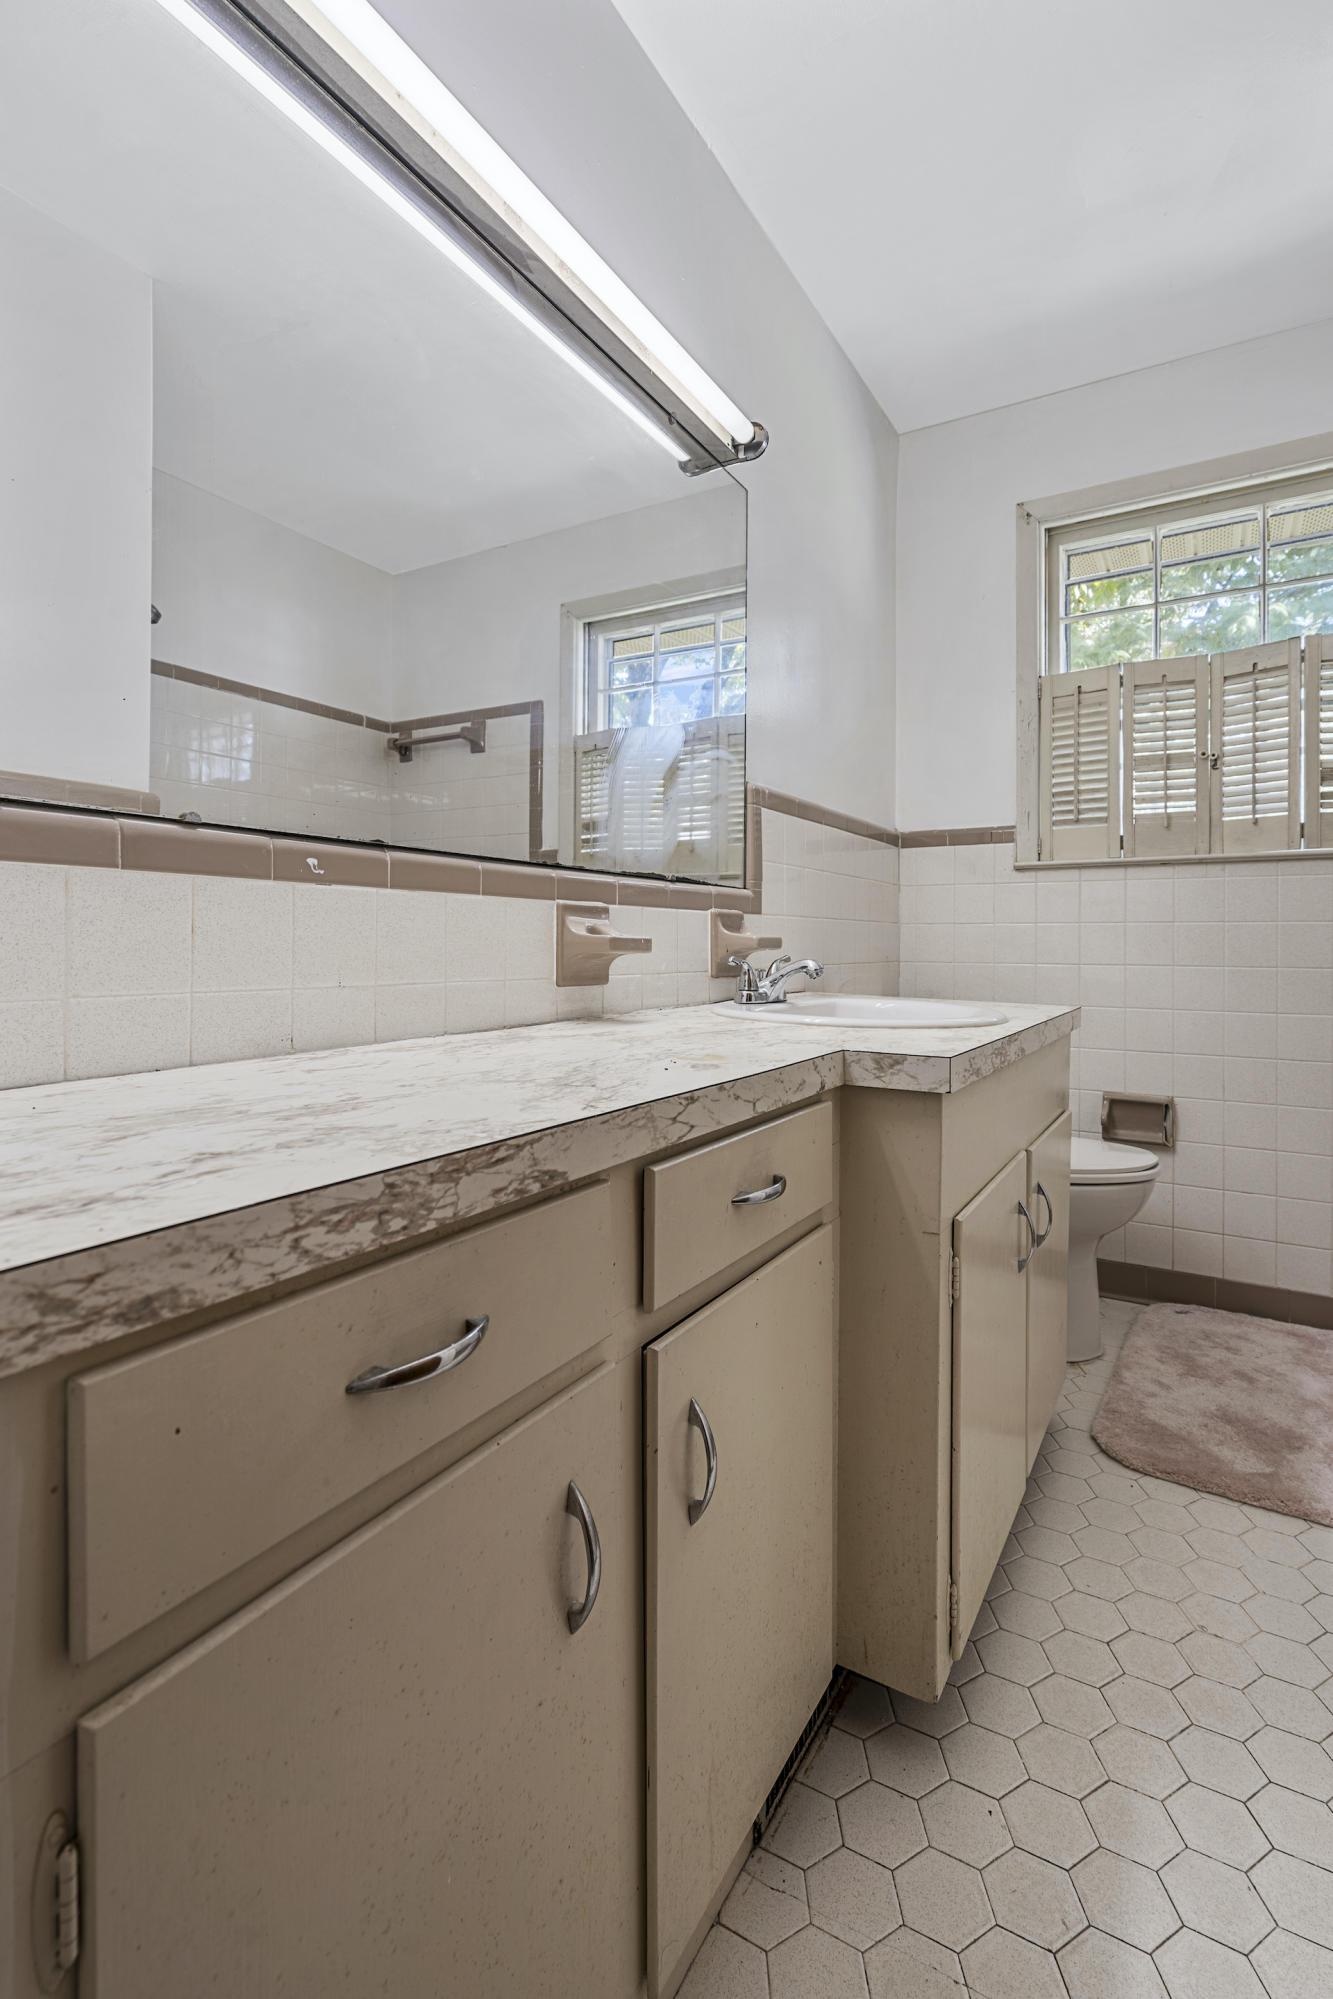 Charlestowne Estates I Homes For Sale - 1137 Culpepper, Charleston, SC - 19